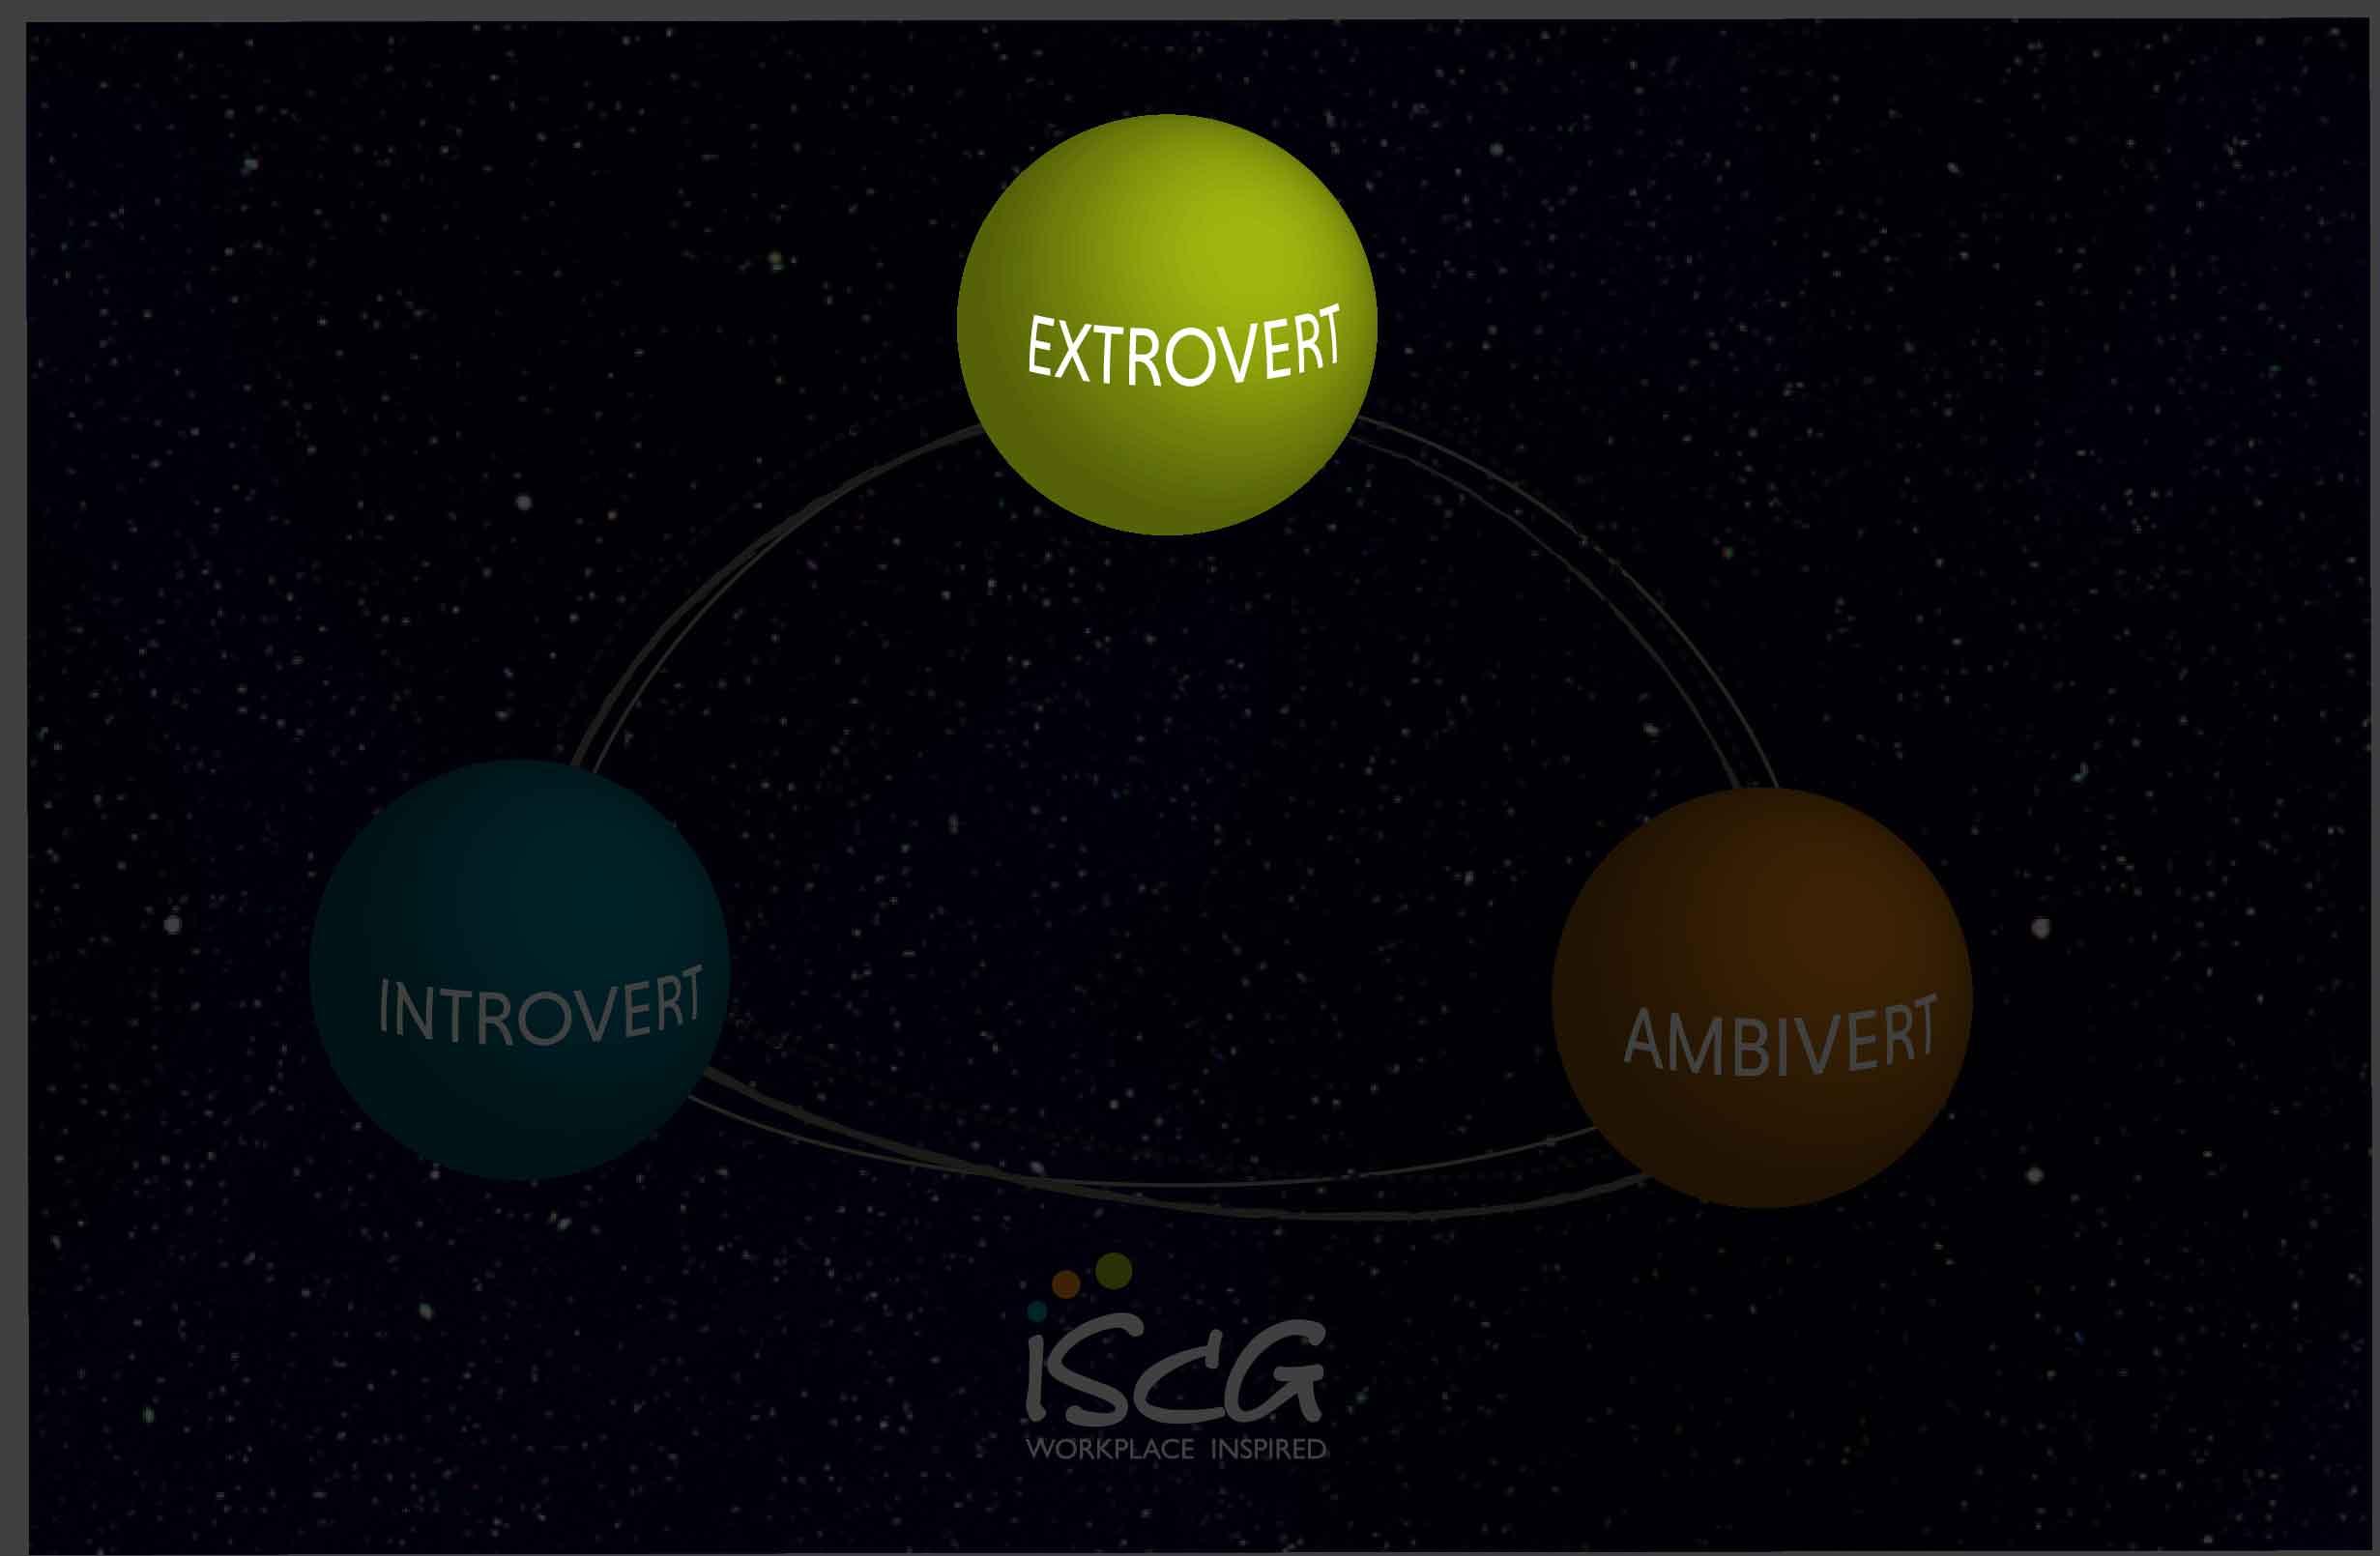 Extrovert Image.jpg